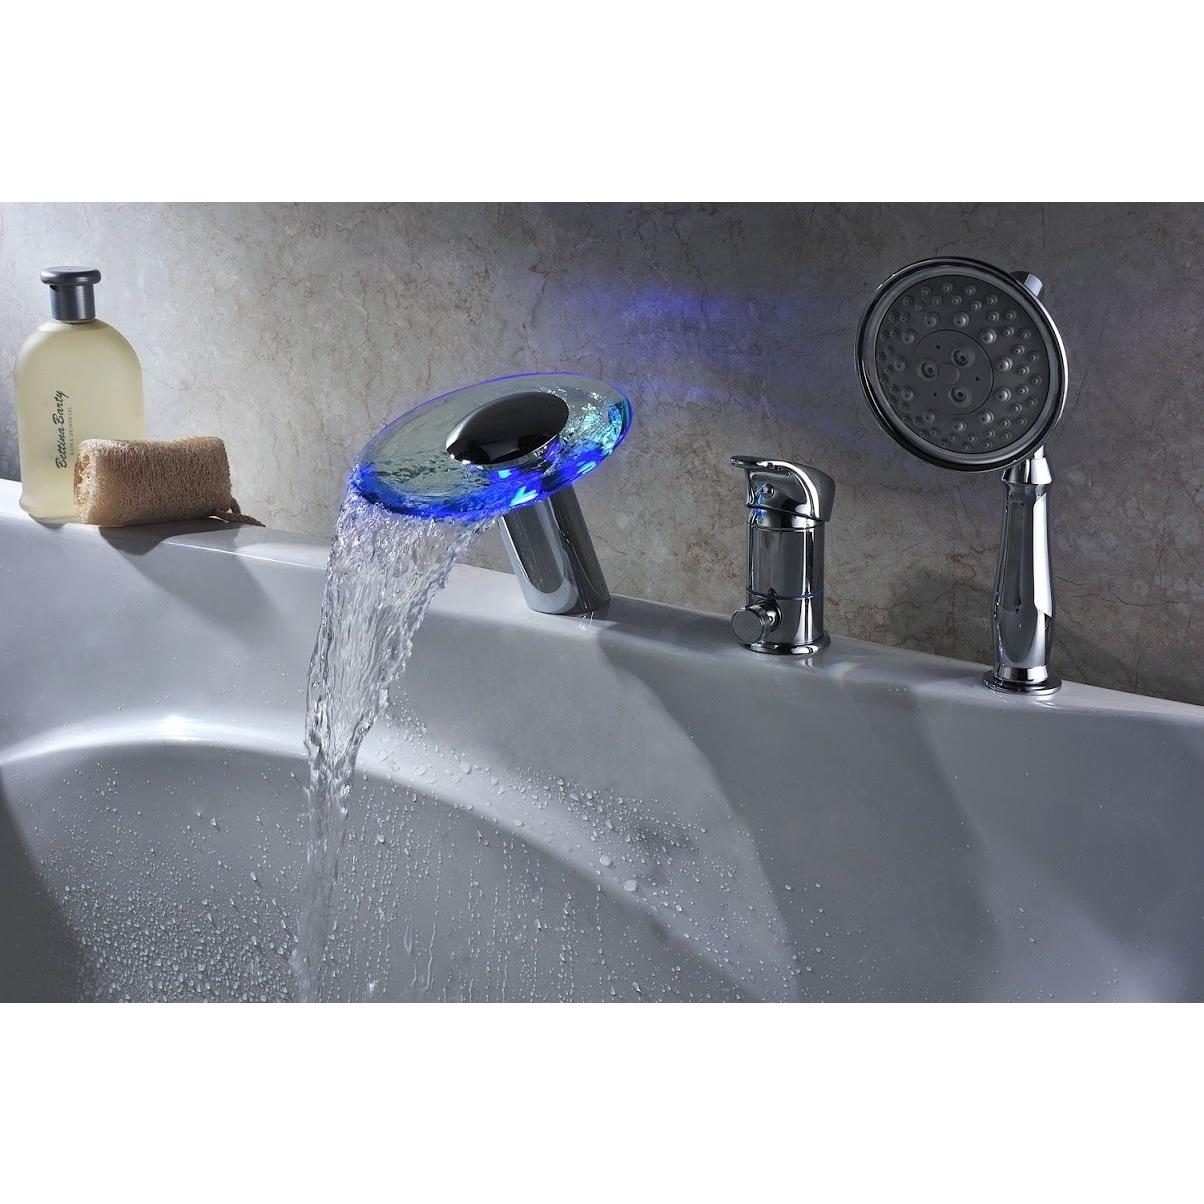 Sumerain LED Thermal Waterfall Bathtub Faucet - Free Shipping ...